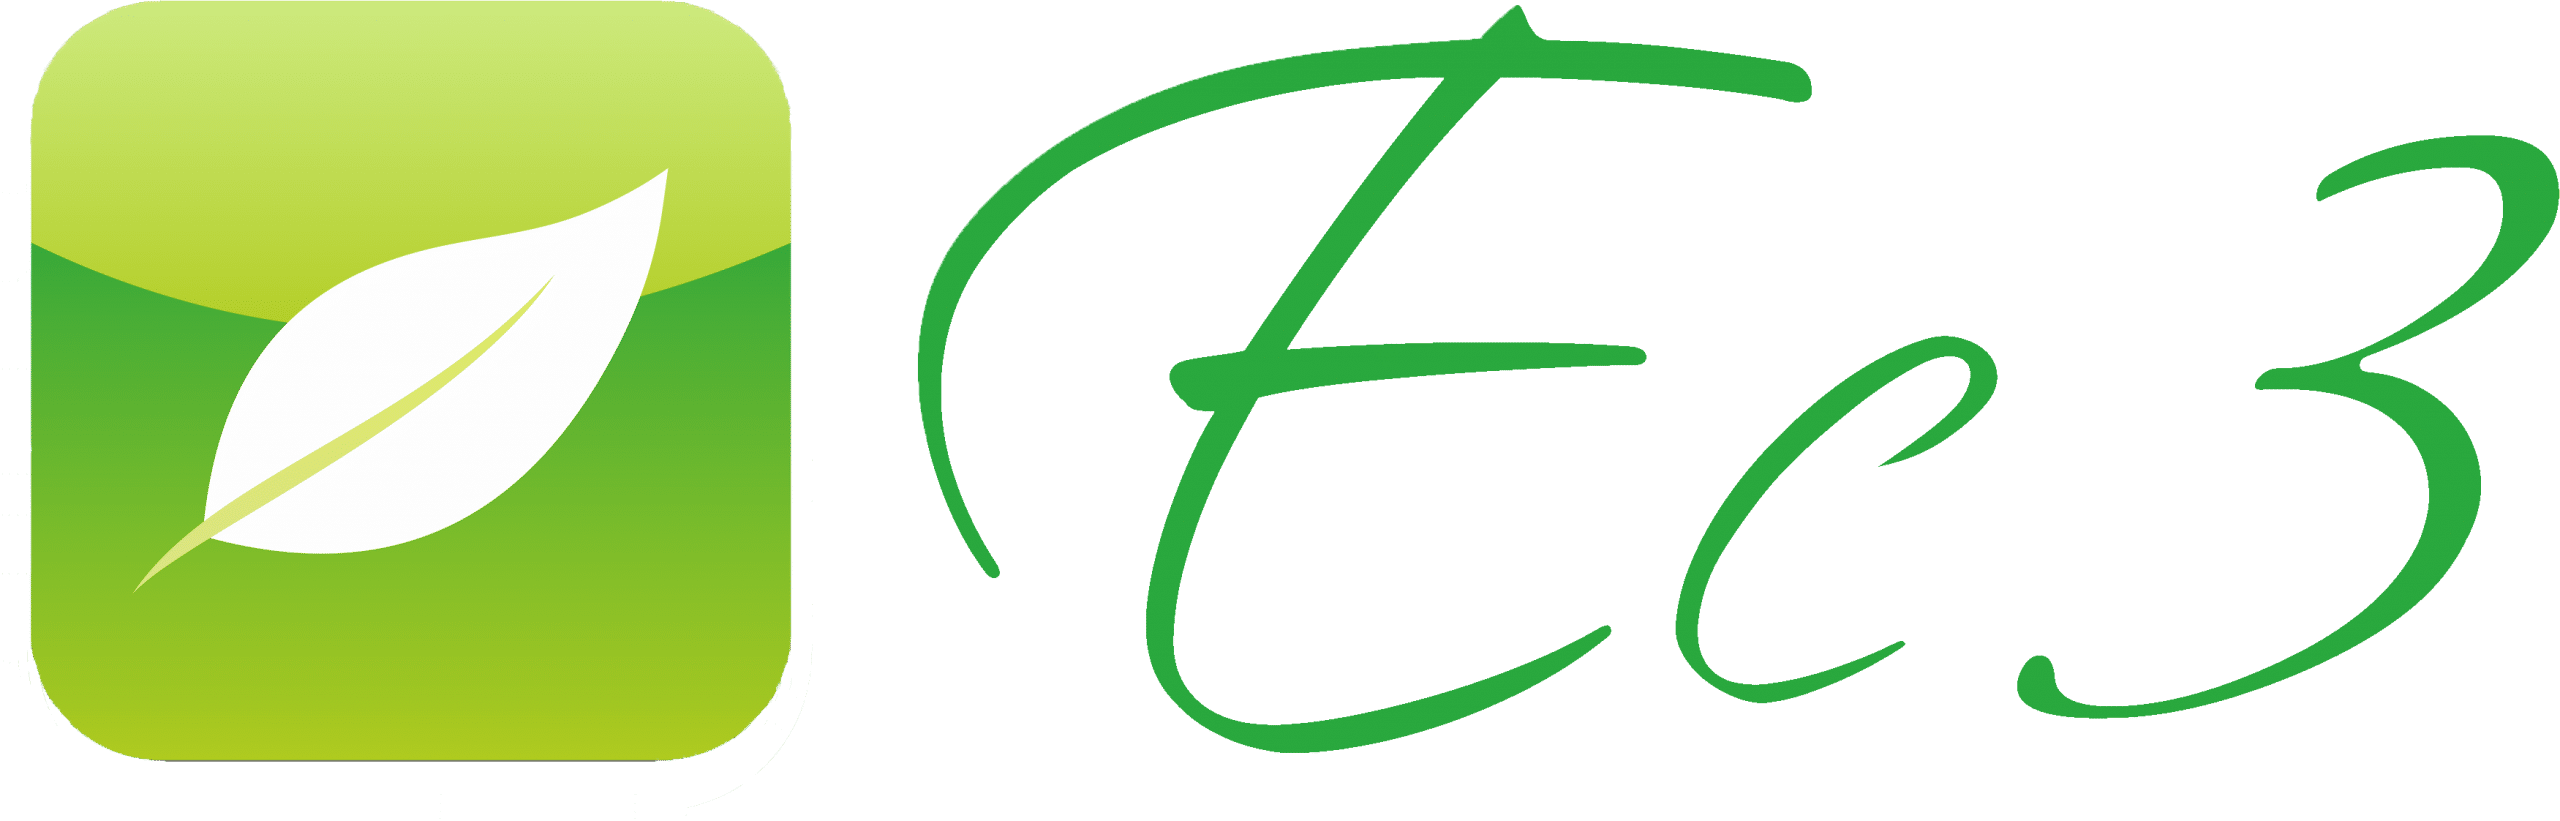 es3bg-logo-nobgn